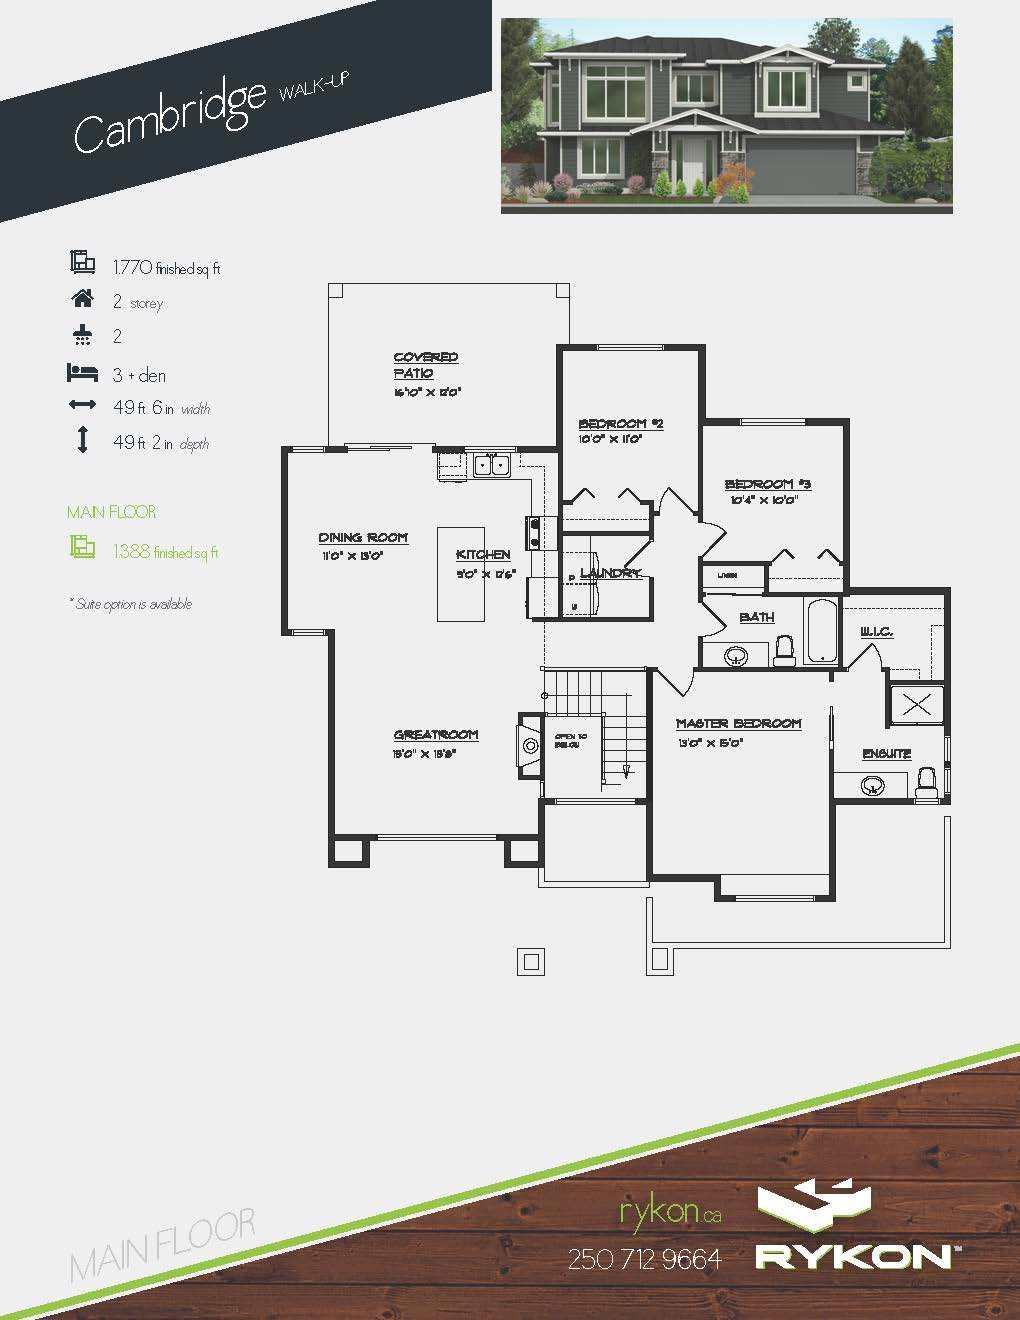 MRH - Cambridge Page 1 Floorplan